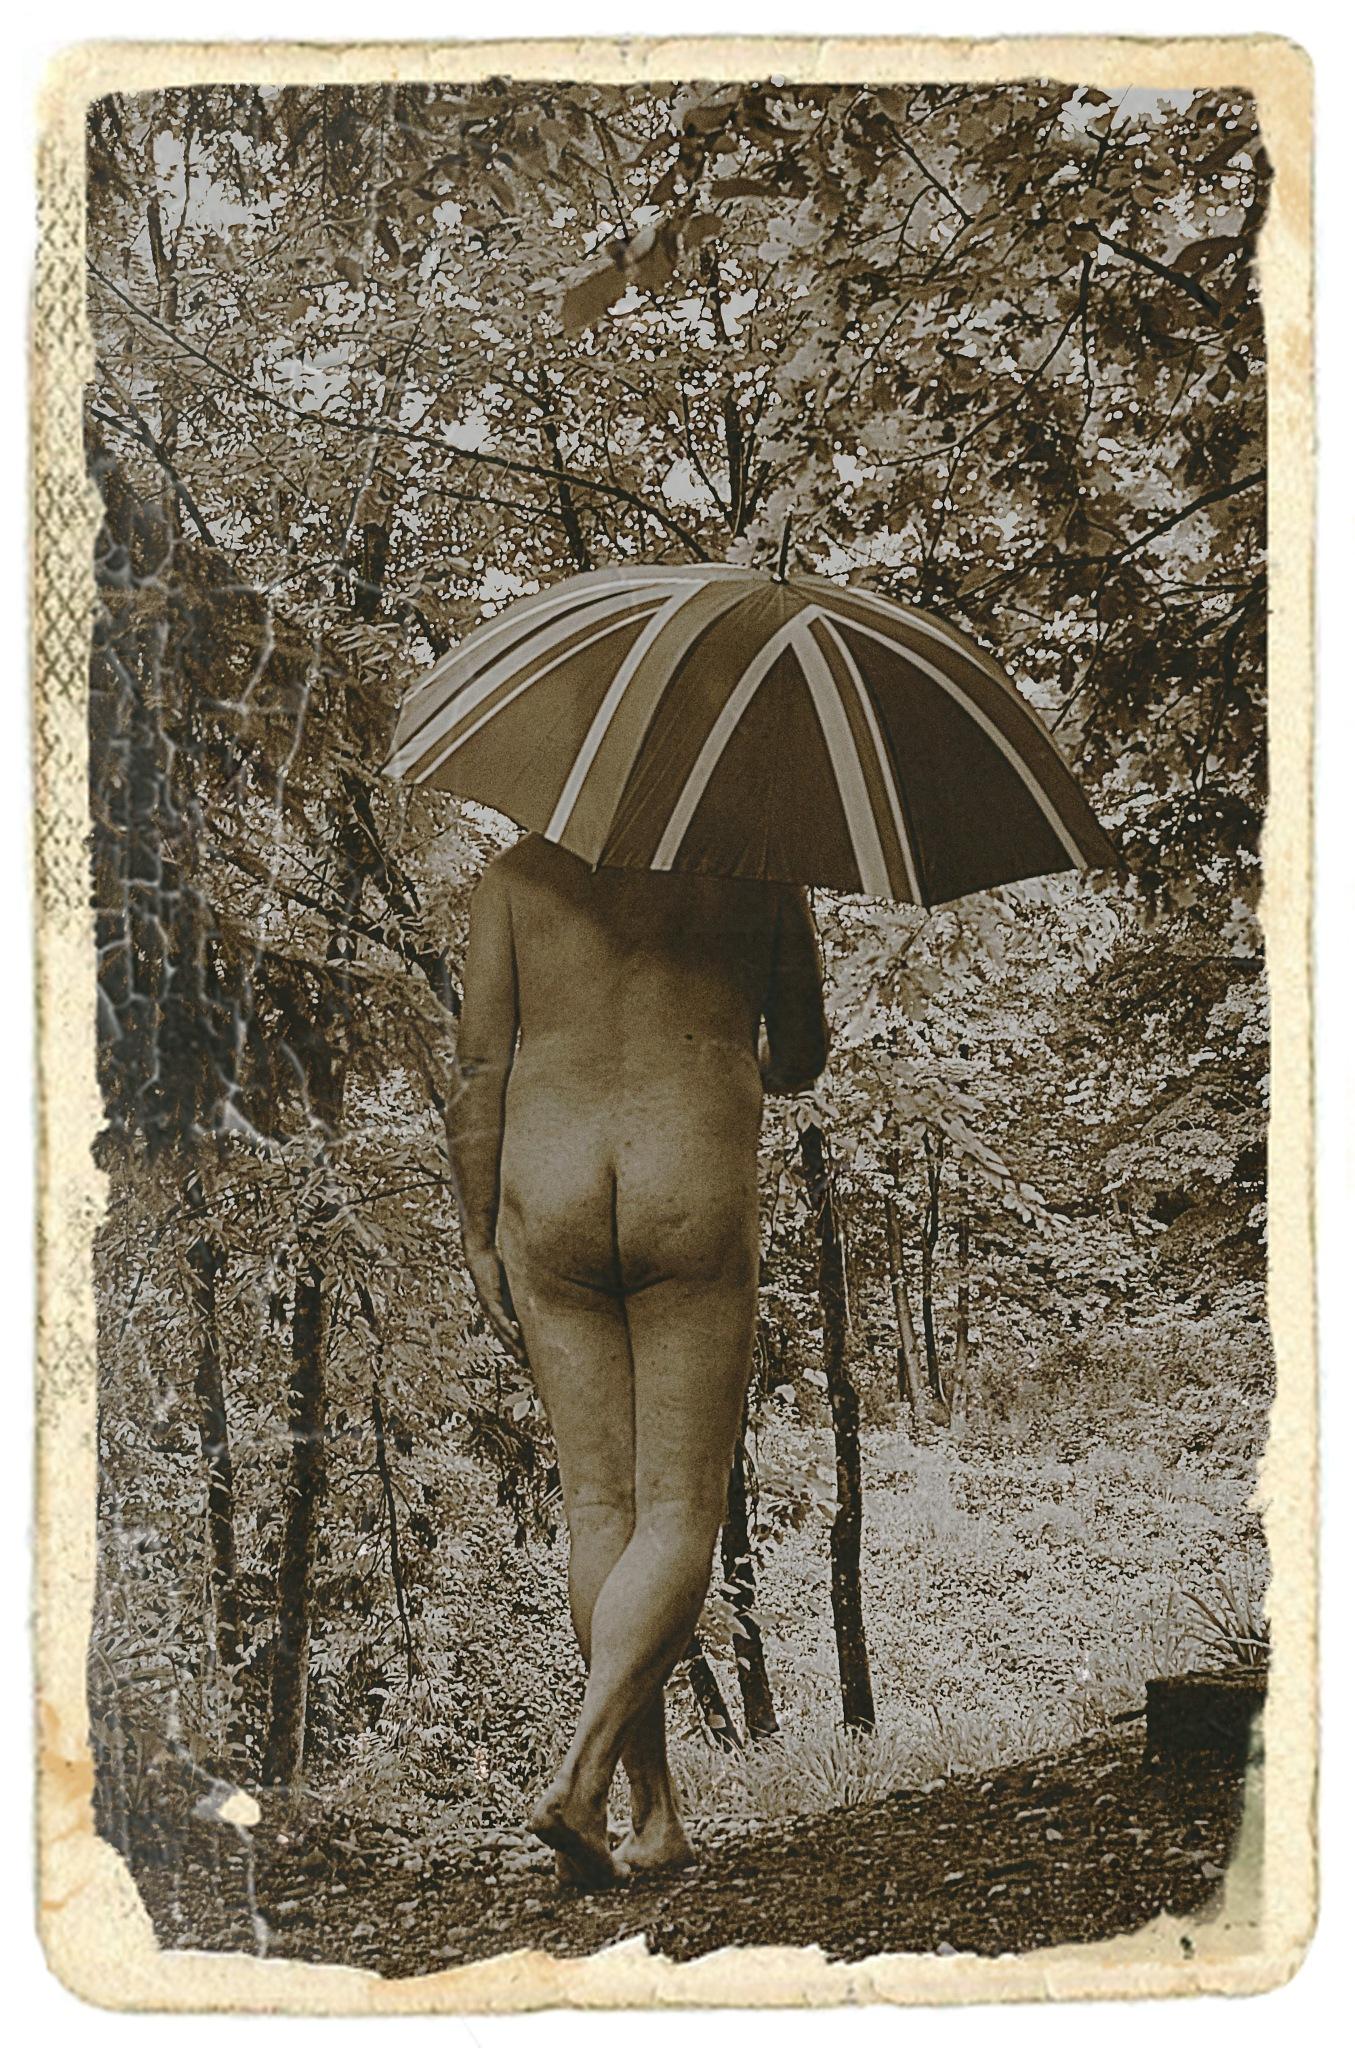 walking (naked) in the rain by tomazek